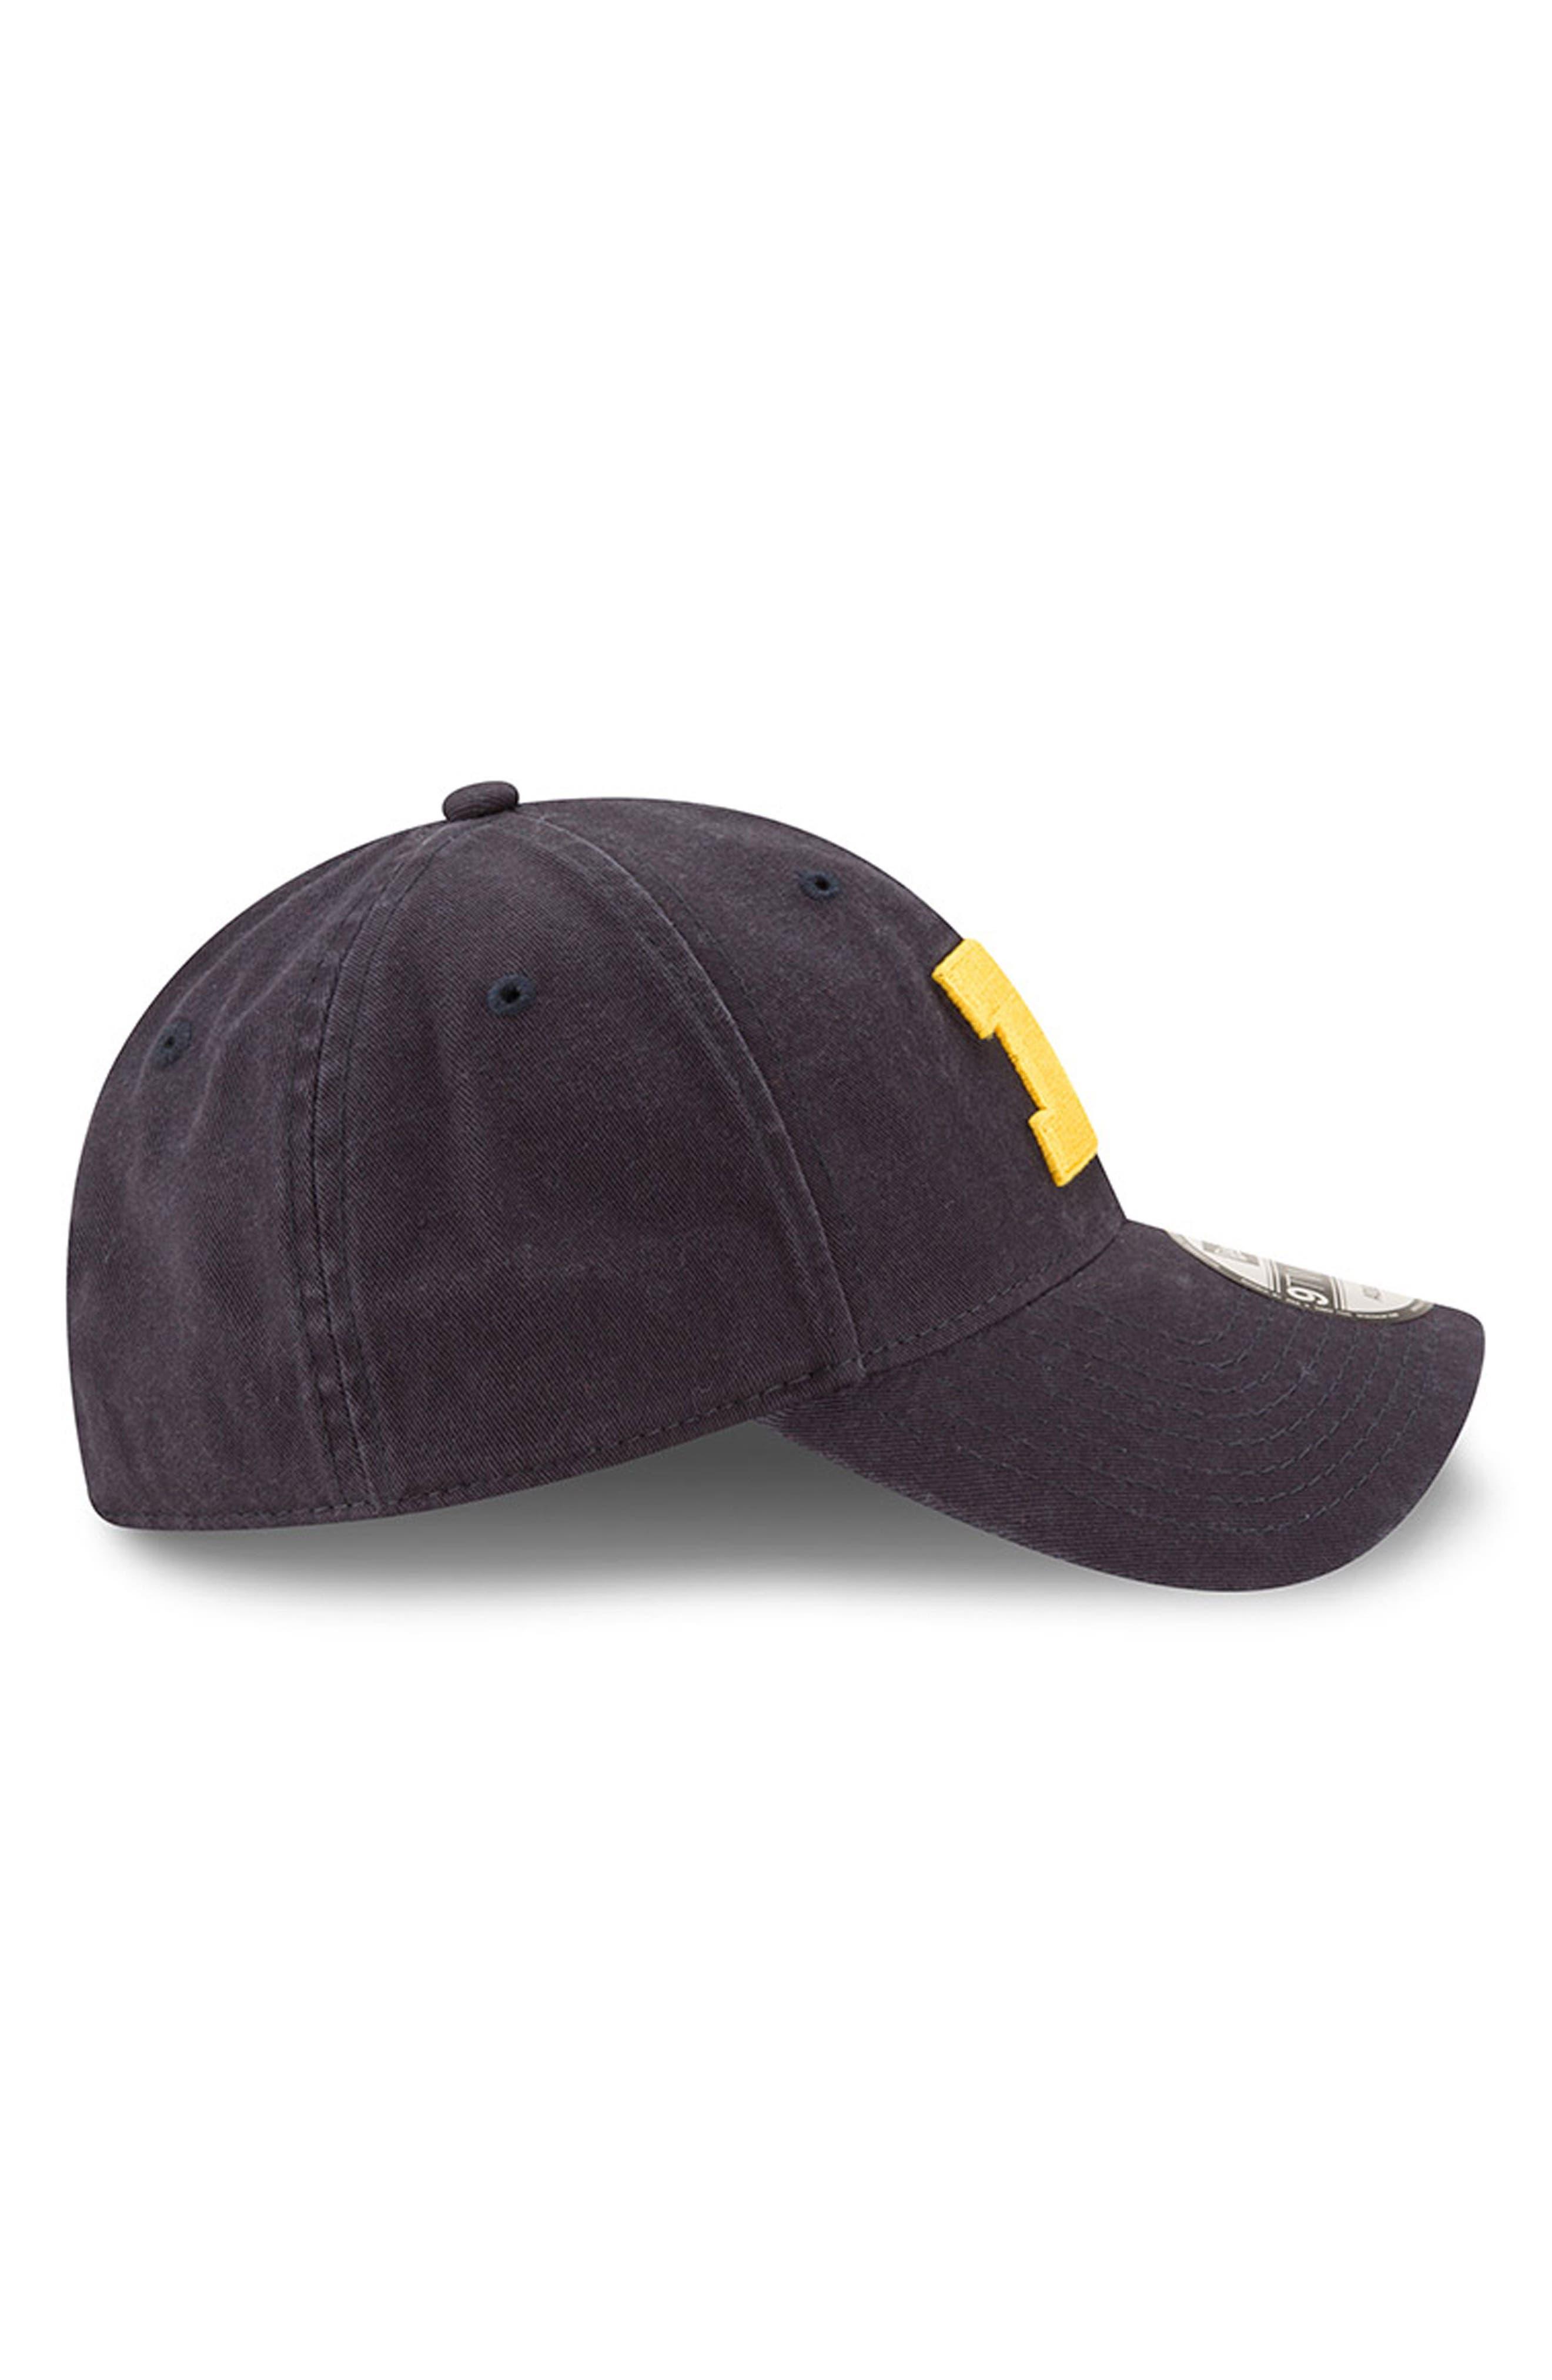 New Era Collegiate Core Classic - Michigan Wolverines Baseball Cap,                             Alternate thumbnail 4, color,                             Michigan Wolverines